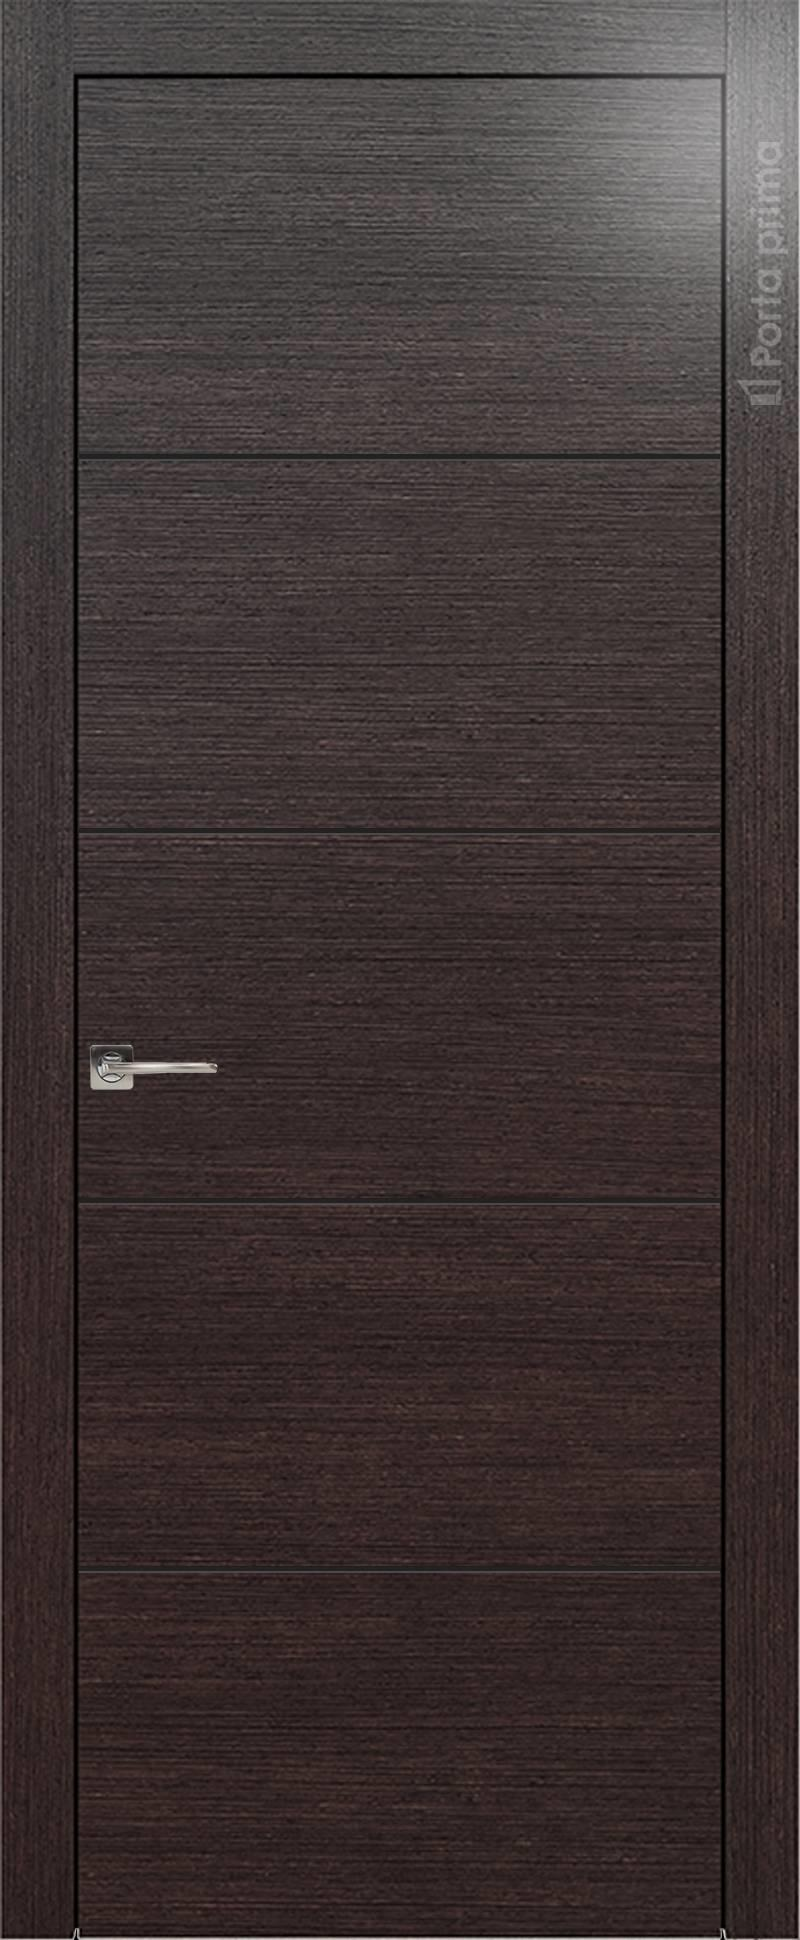 Tivoli Д-2 цвет - Венге Шоколад Без стекла (ДГ)